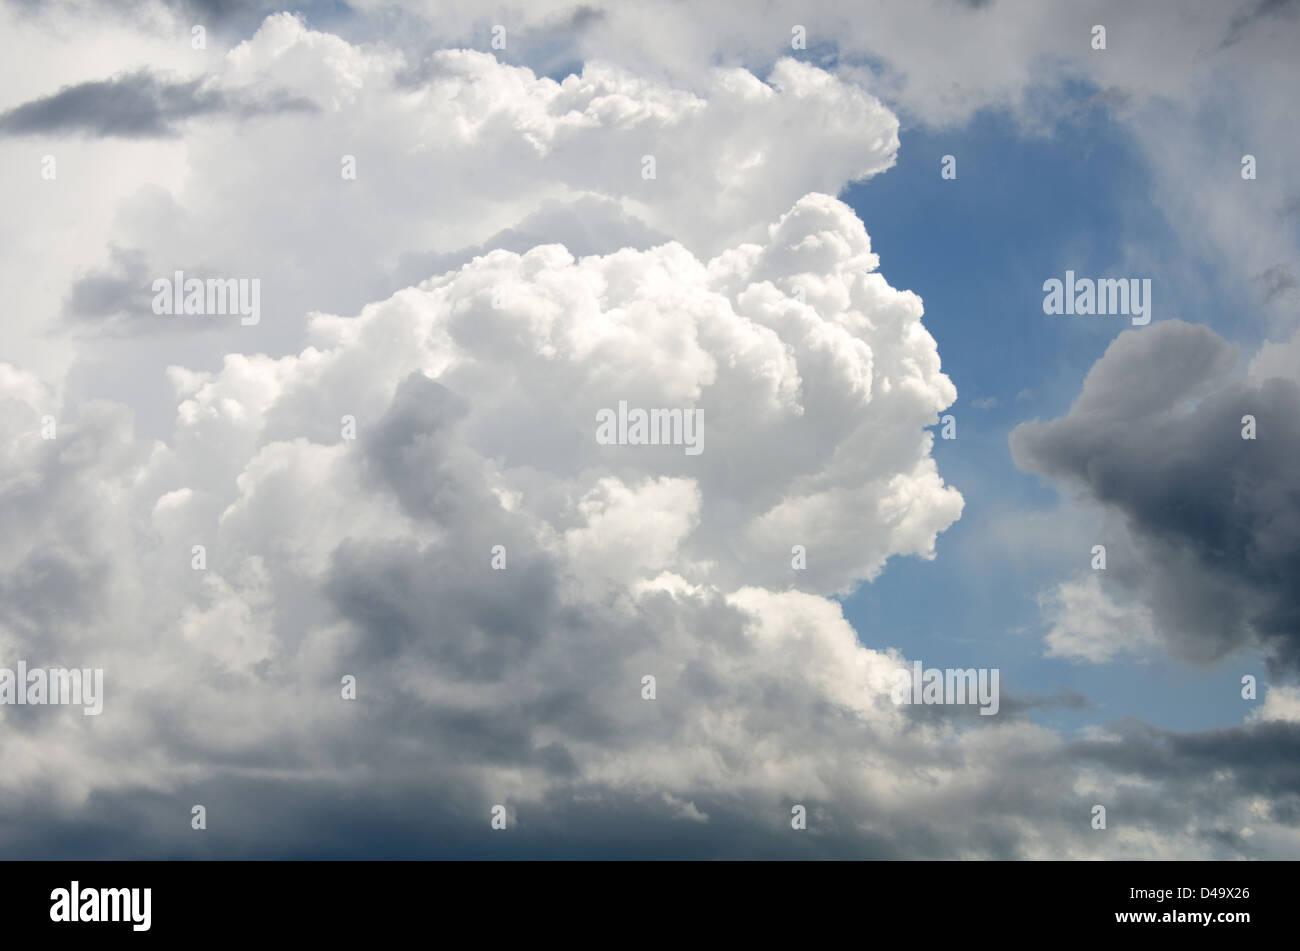 Cumulonimbus clouds pile higher and higher as a rain storm builds over Campobello Island, New Brunswick - Stock Image